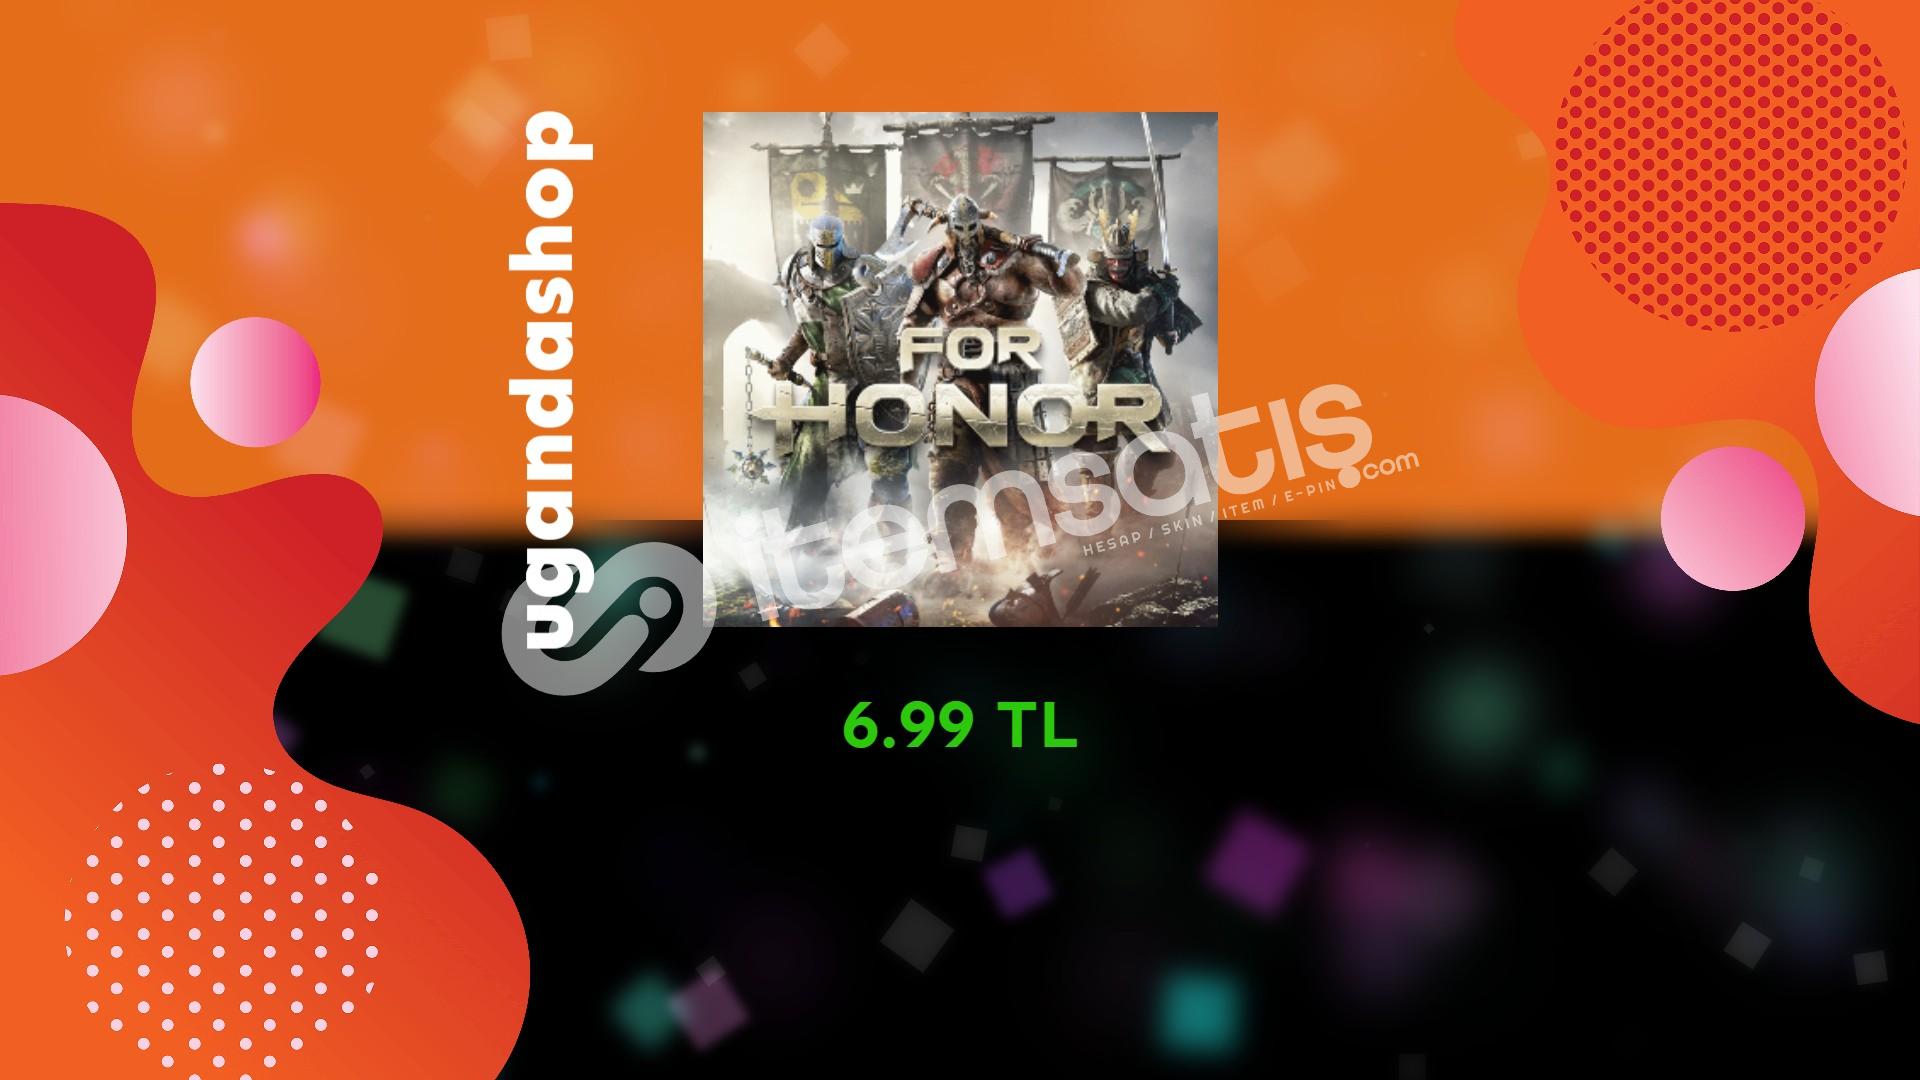 For Honor Online Uplay/Ubisoft Hesap + Garanti